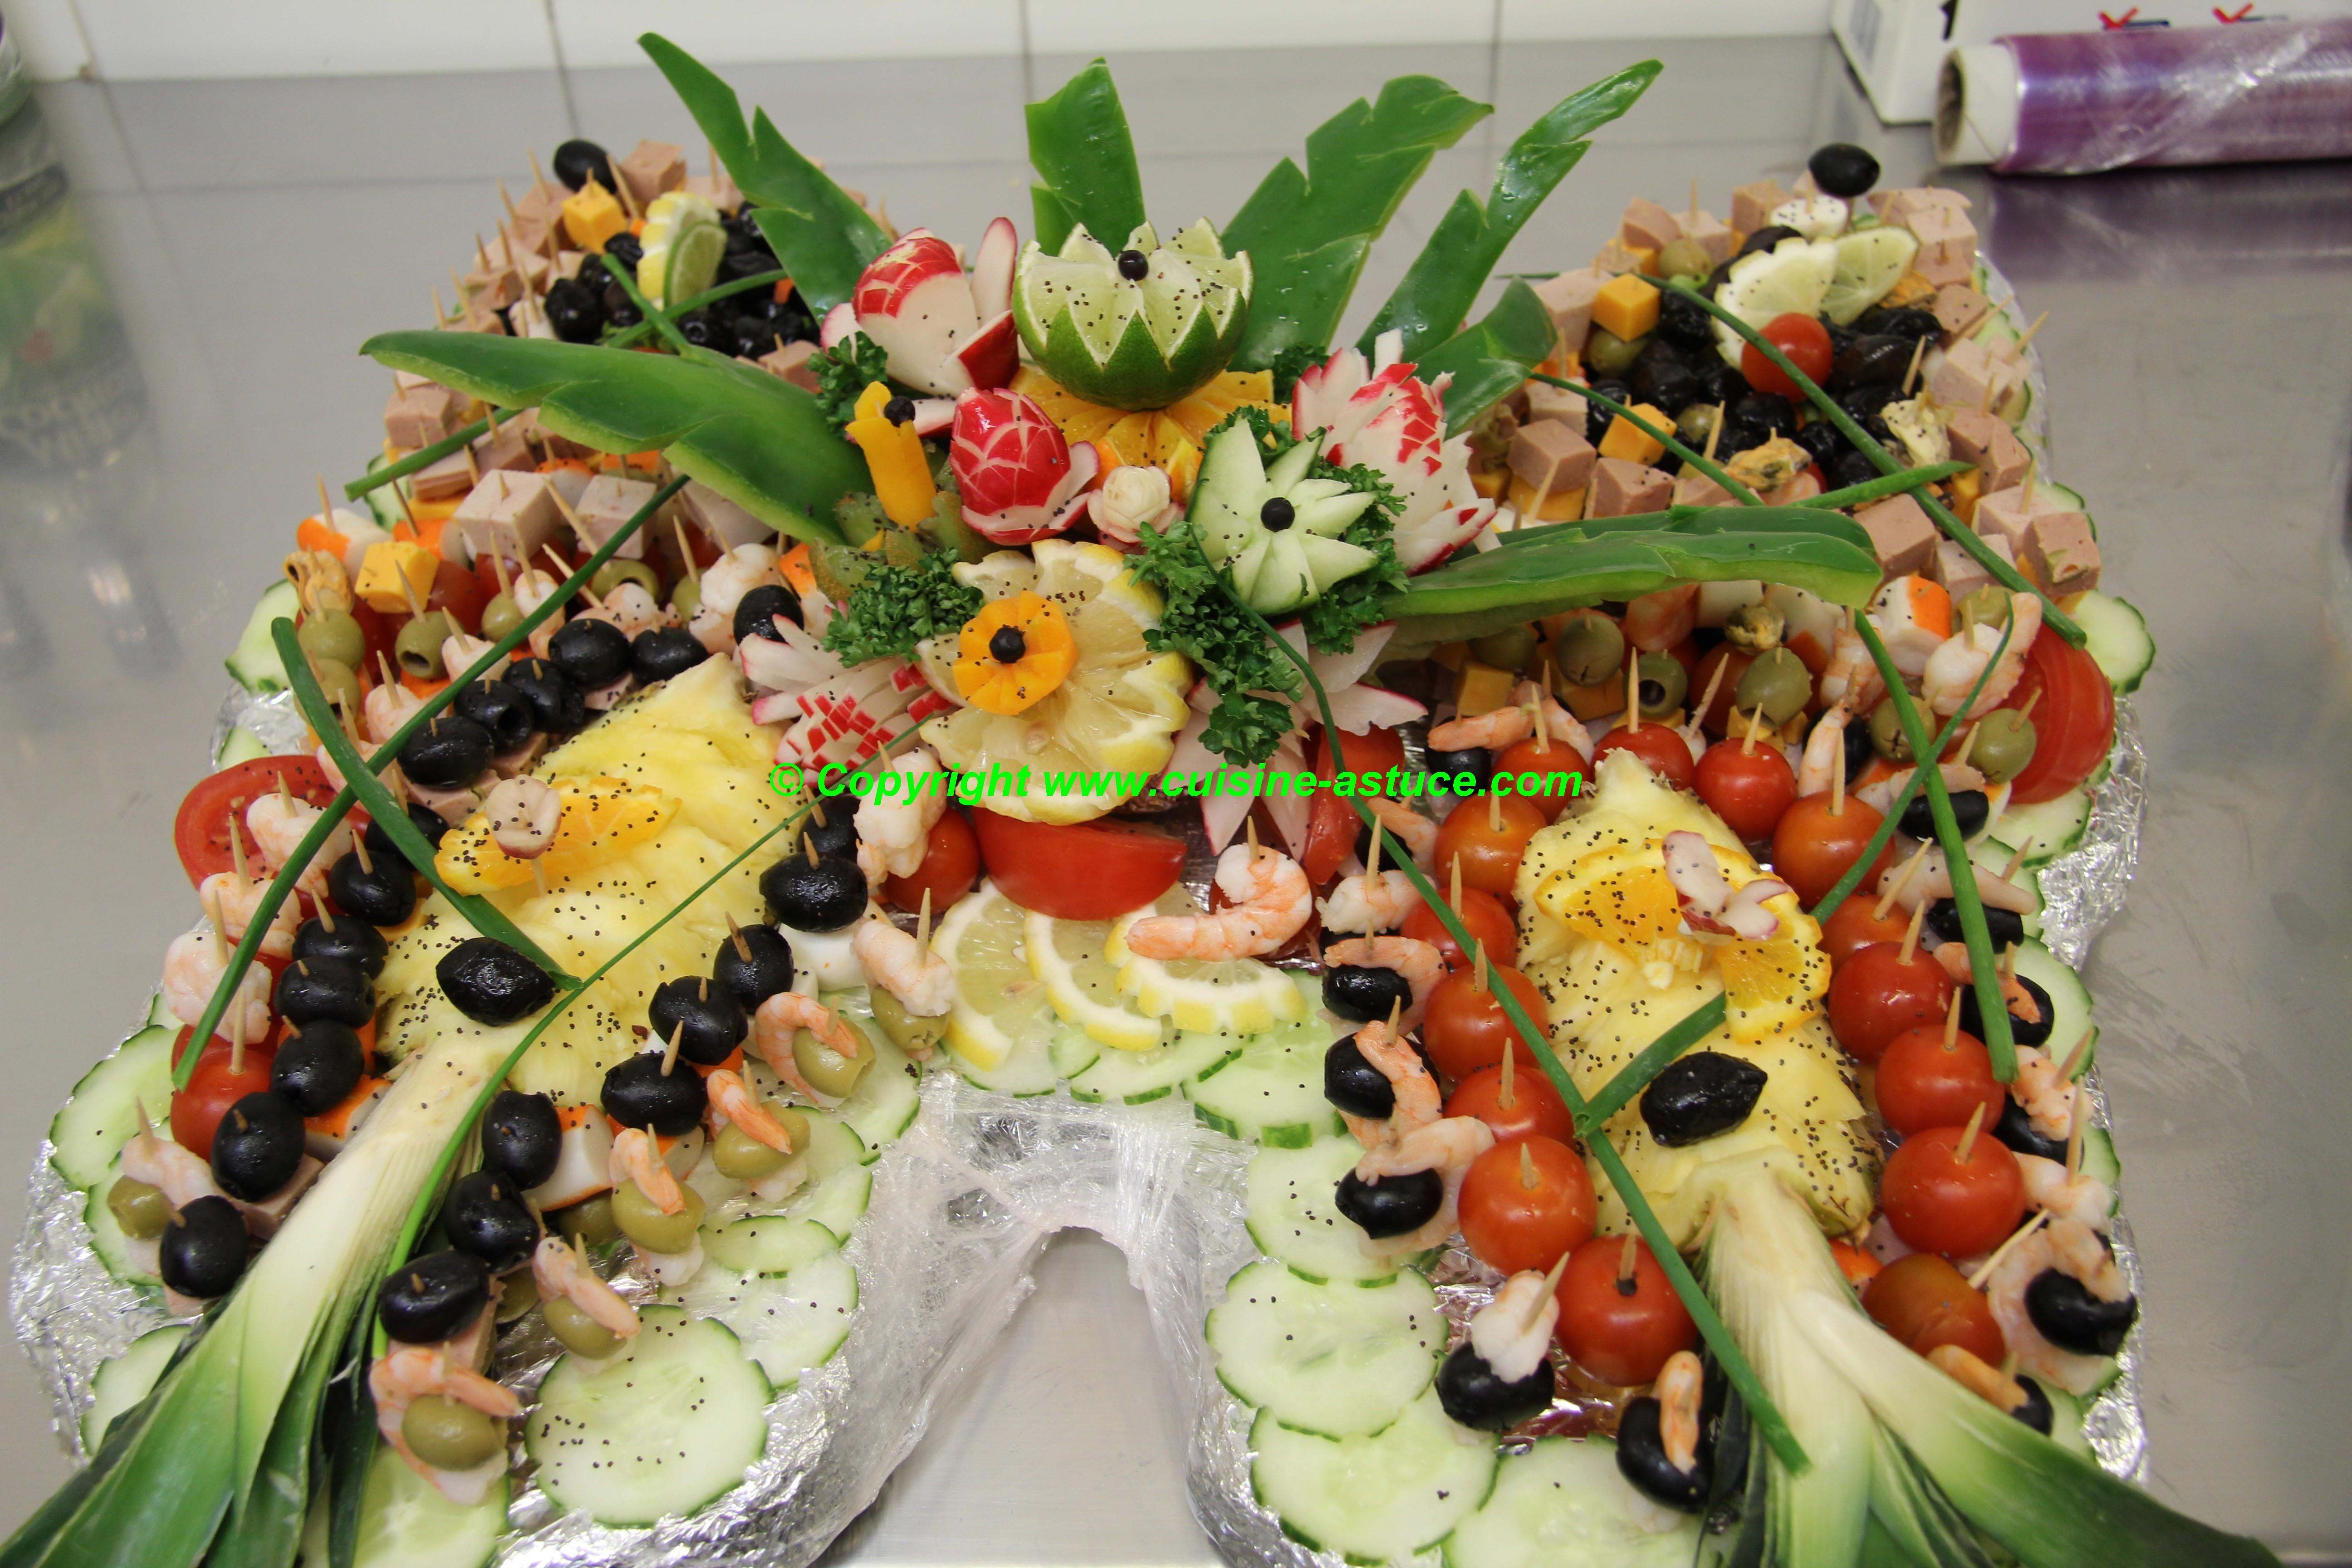 Recettes de cuisine et astuces d 39 un vrai cuisinier for Astuce de cuisine